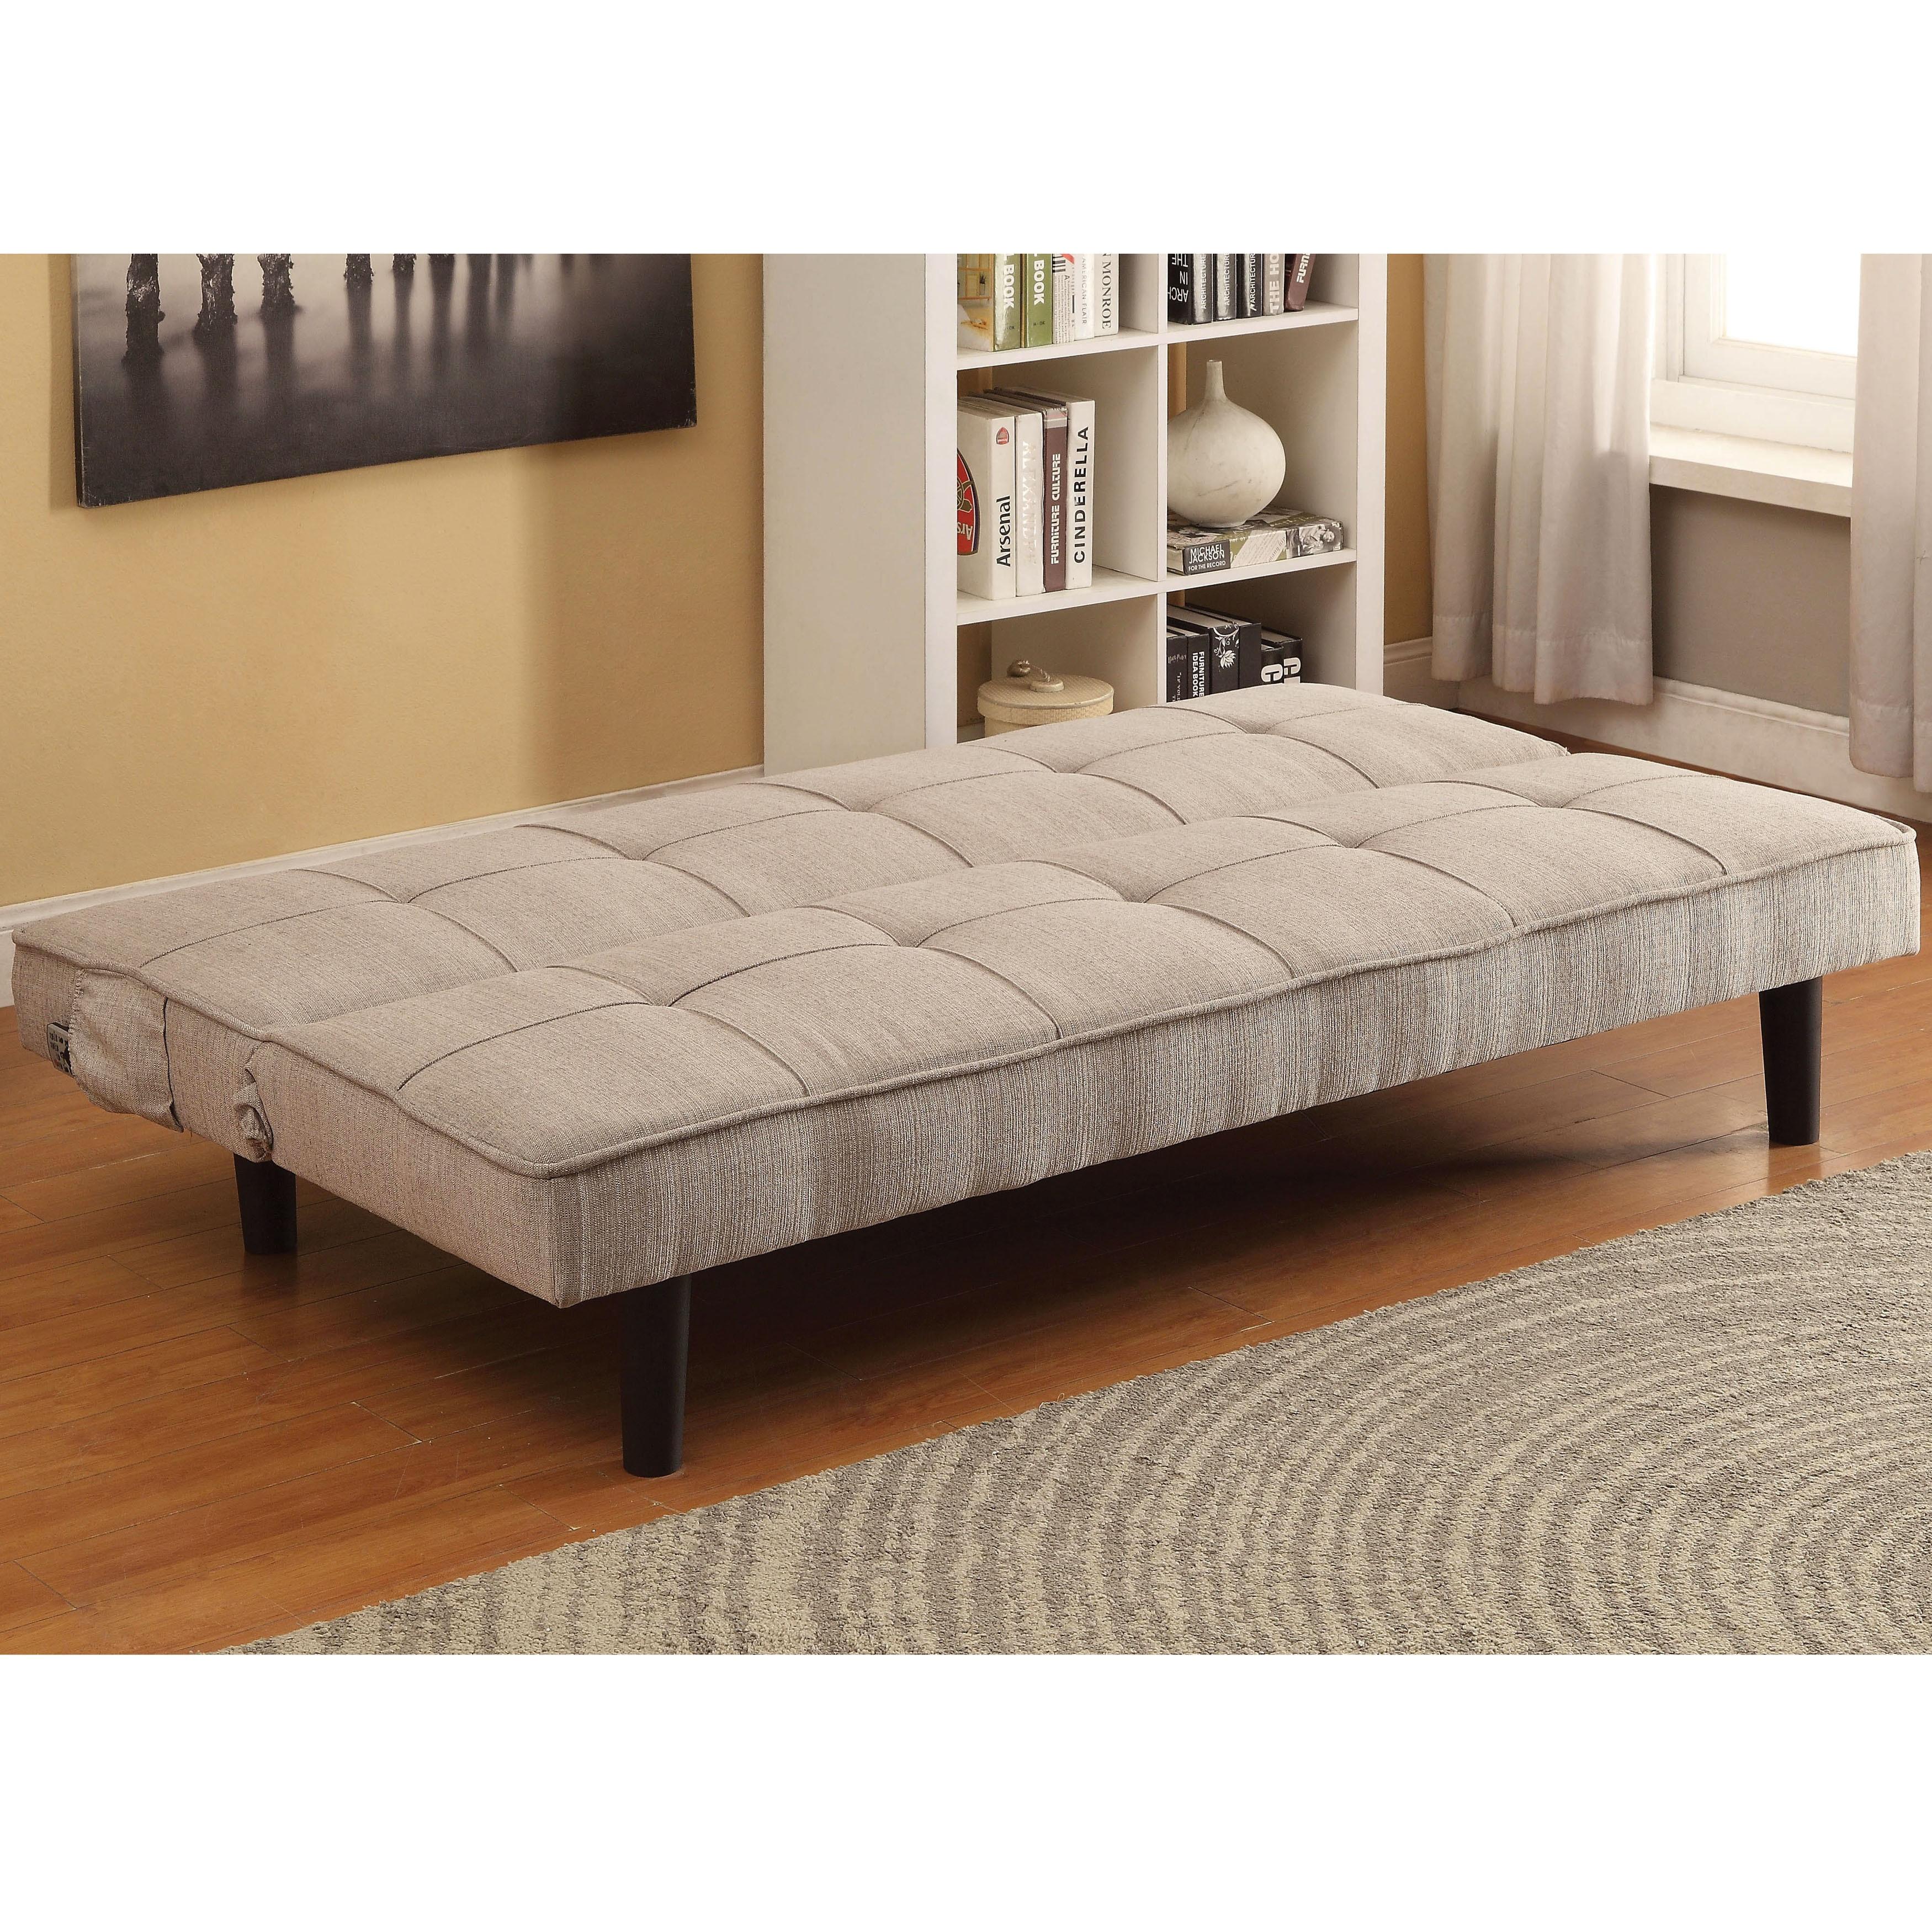 furniture of america calbry contemporary flax fabric futon sofa